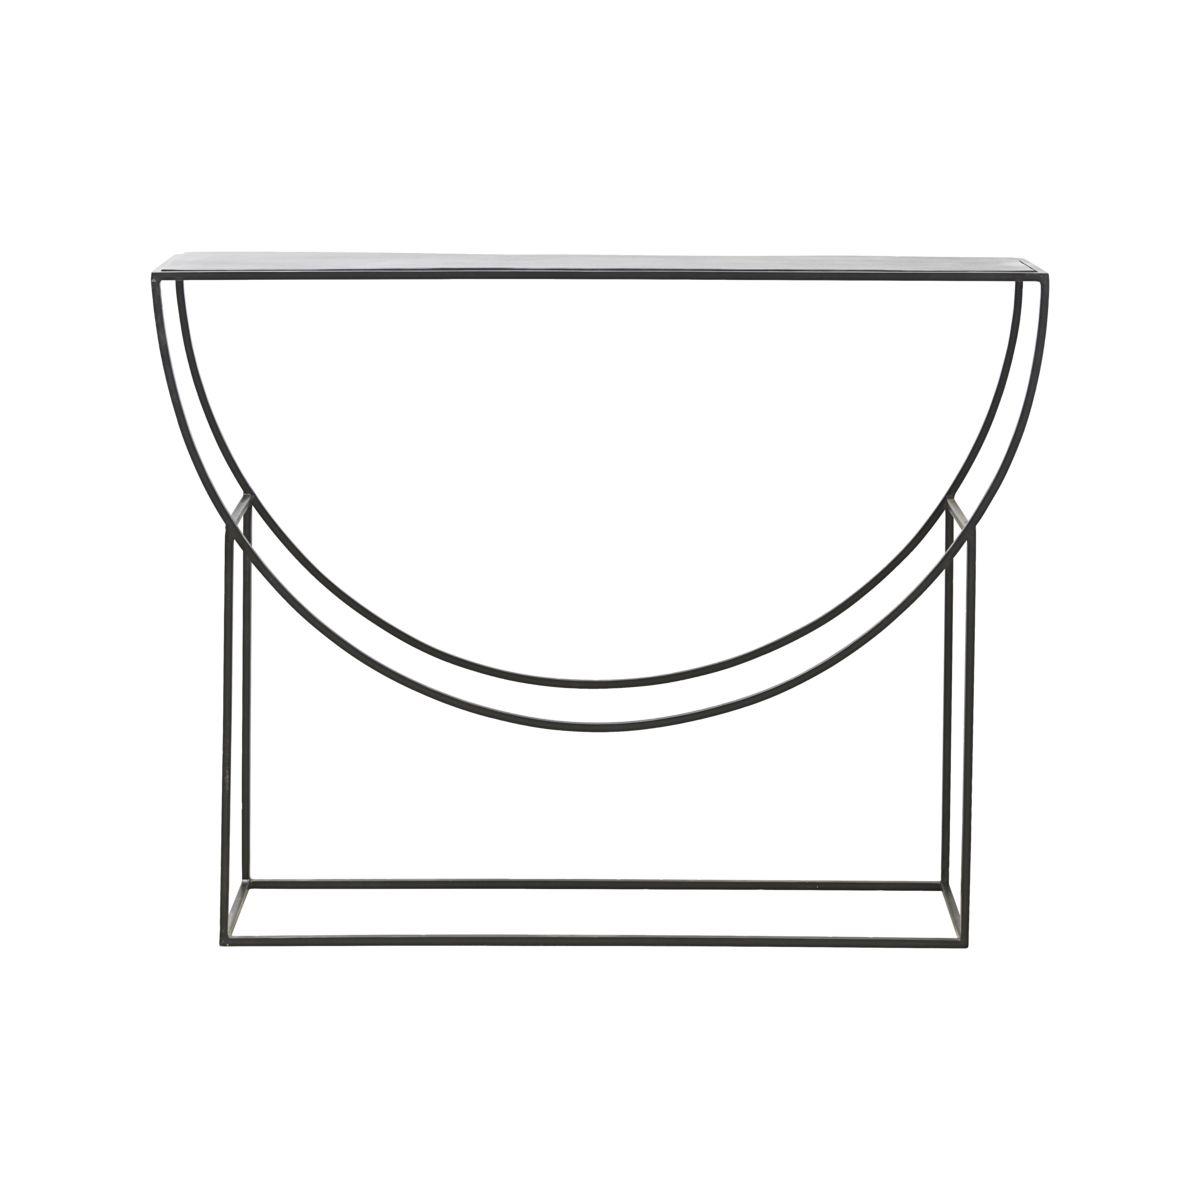 Image of   House Doctor konsol, Skulptur, L: 120 CM, B: 28 CM, H: 90 CM